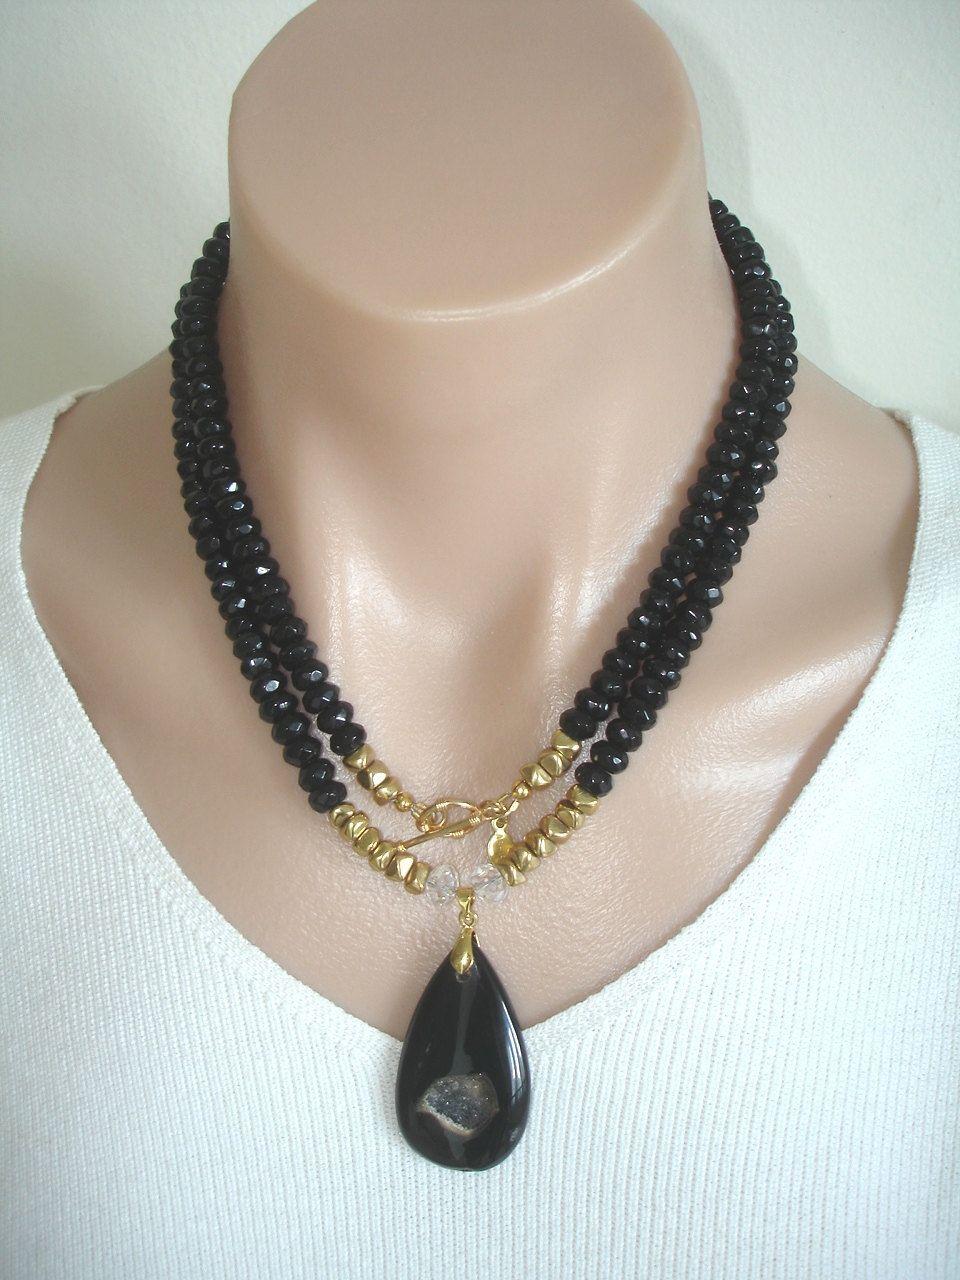 2063861a5a37 Ashira Black Onyx Gemstone Necklace with Luscious Black Agate Druzy ...